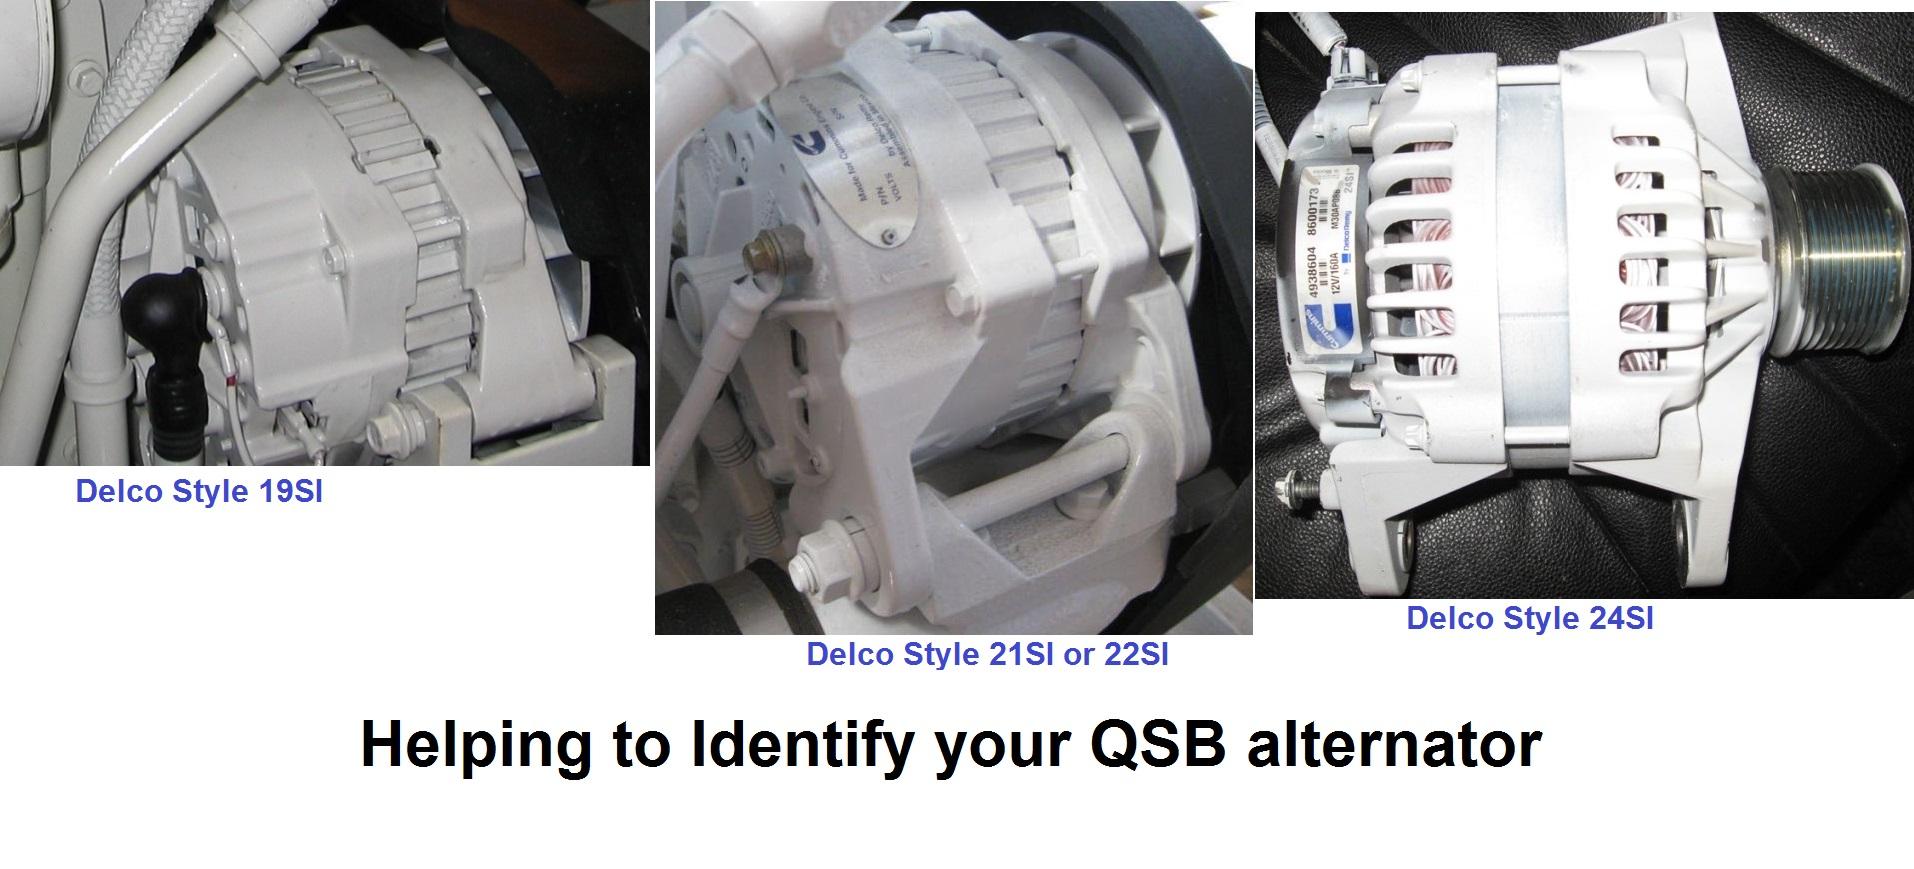 Identifying The Alternator On Qsb 59 Seaboard Marine 24si Wiring Diagram Alternators